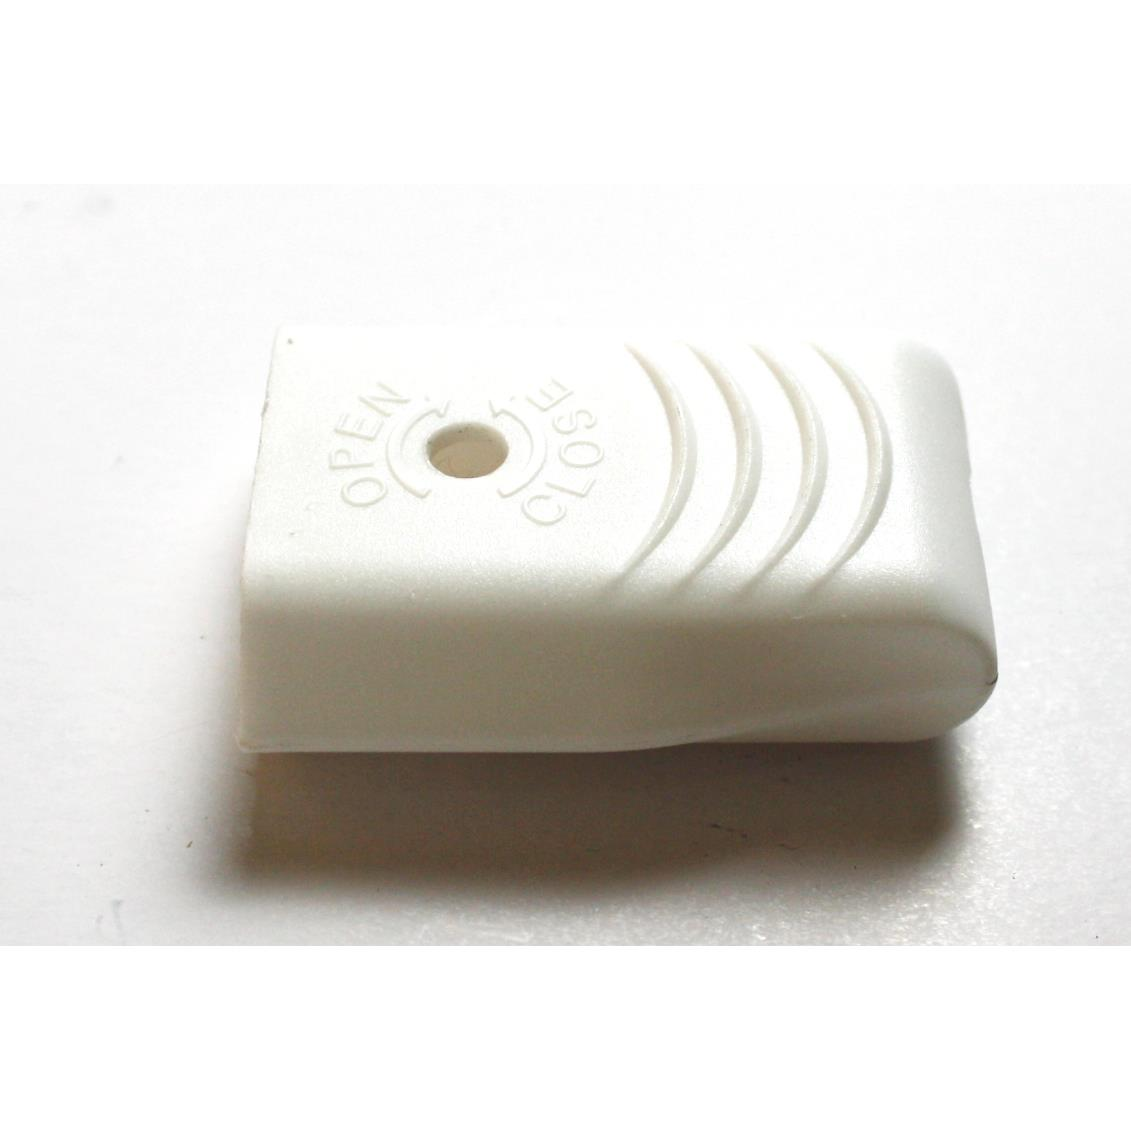 Eurostecker gerade flach Weiß Netzstecker Euro Stecker Stromstecker 230V 2,5A ,OKKO,KF-GRC-1, 4772013040804